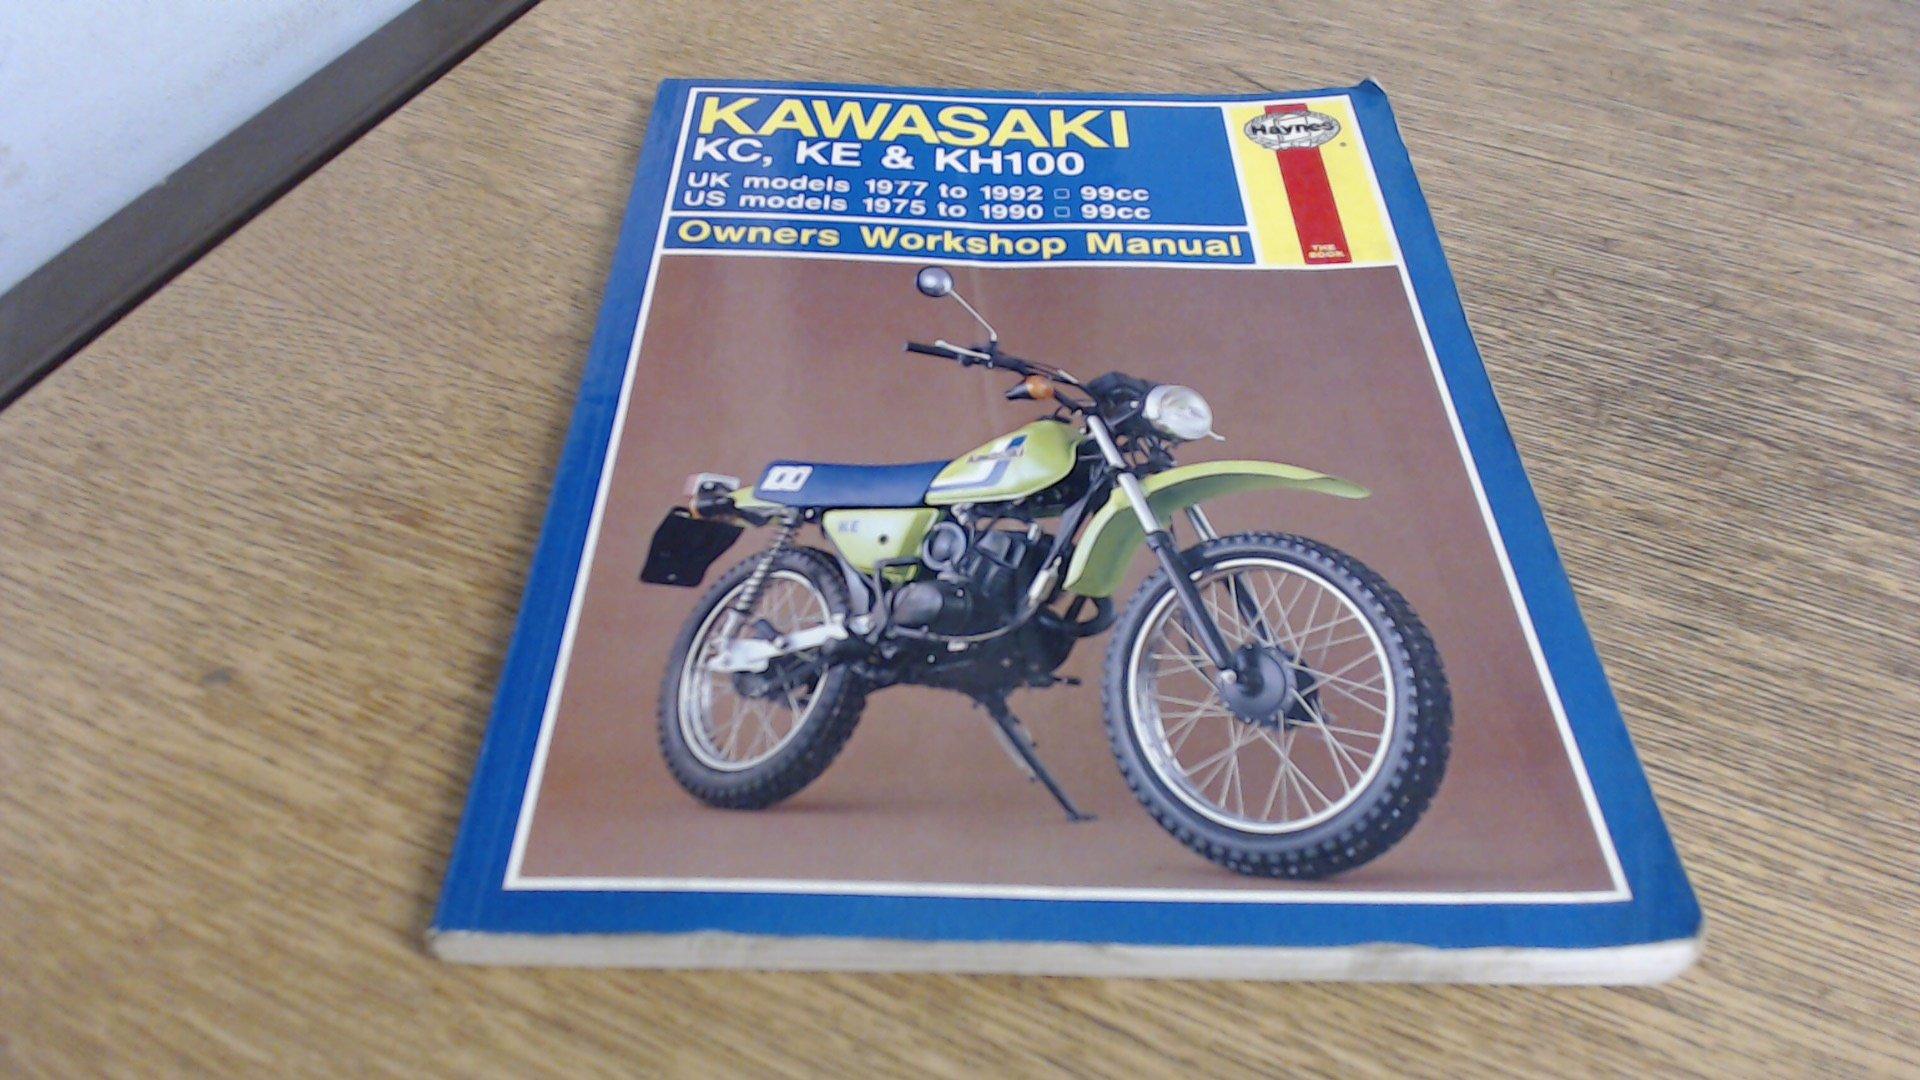 Kawasaki KC, KE & KH 100 1975-90 Owner's Workshop Manual (Haynes Owners  Workshop Manuals): Jeremy Churchill: 9781850108467: Amazon.com: Books